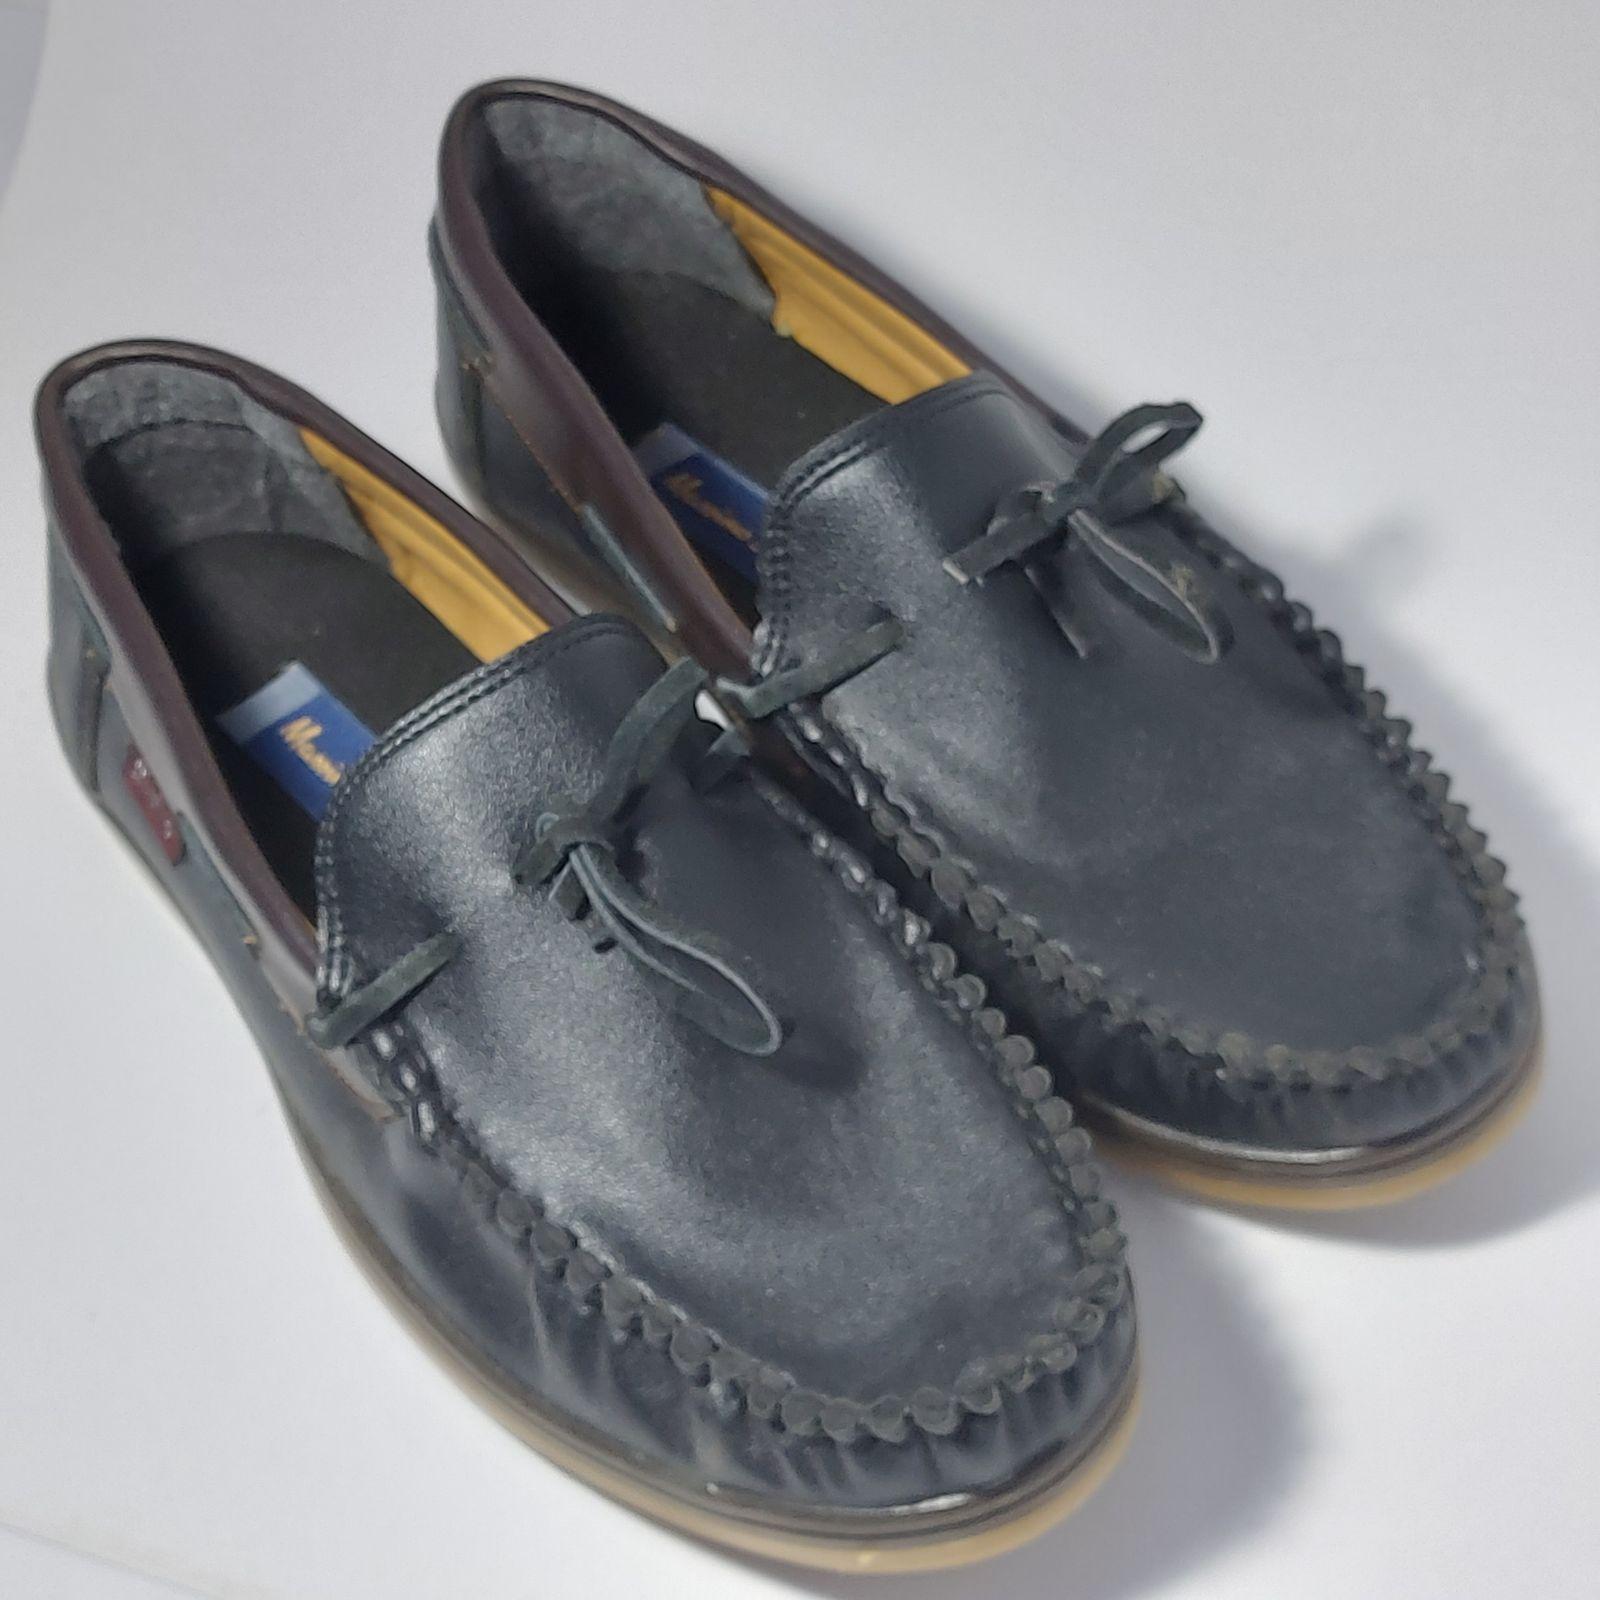 کفش روزمره مردانه مدل CH002 -  - 3